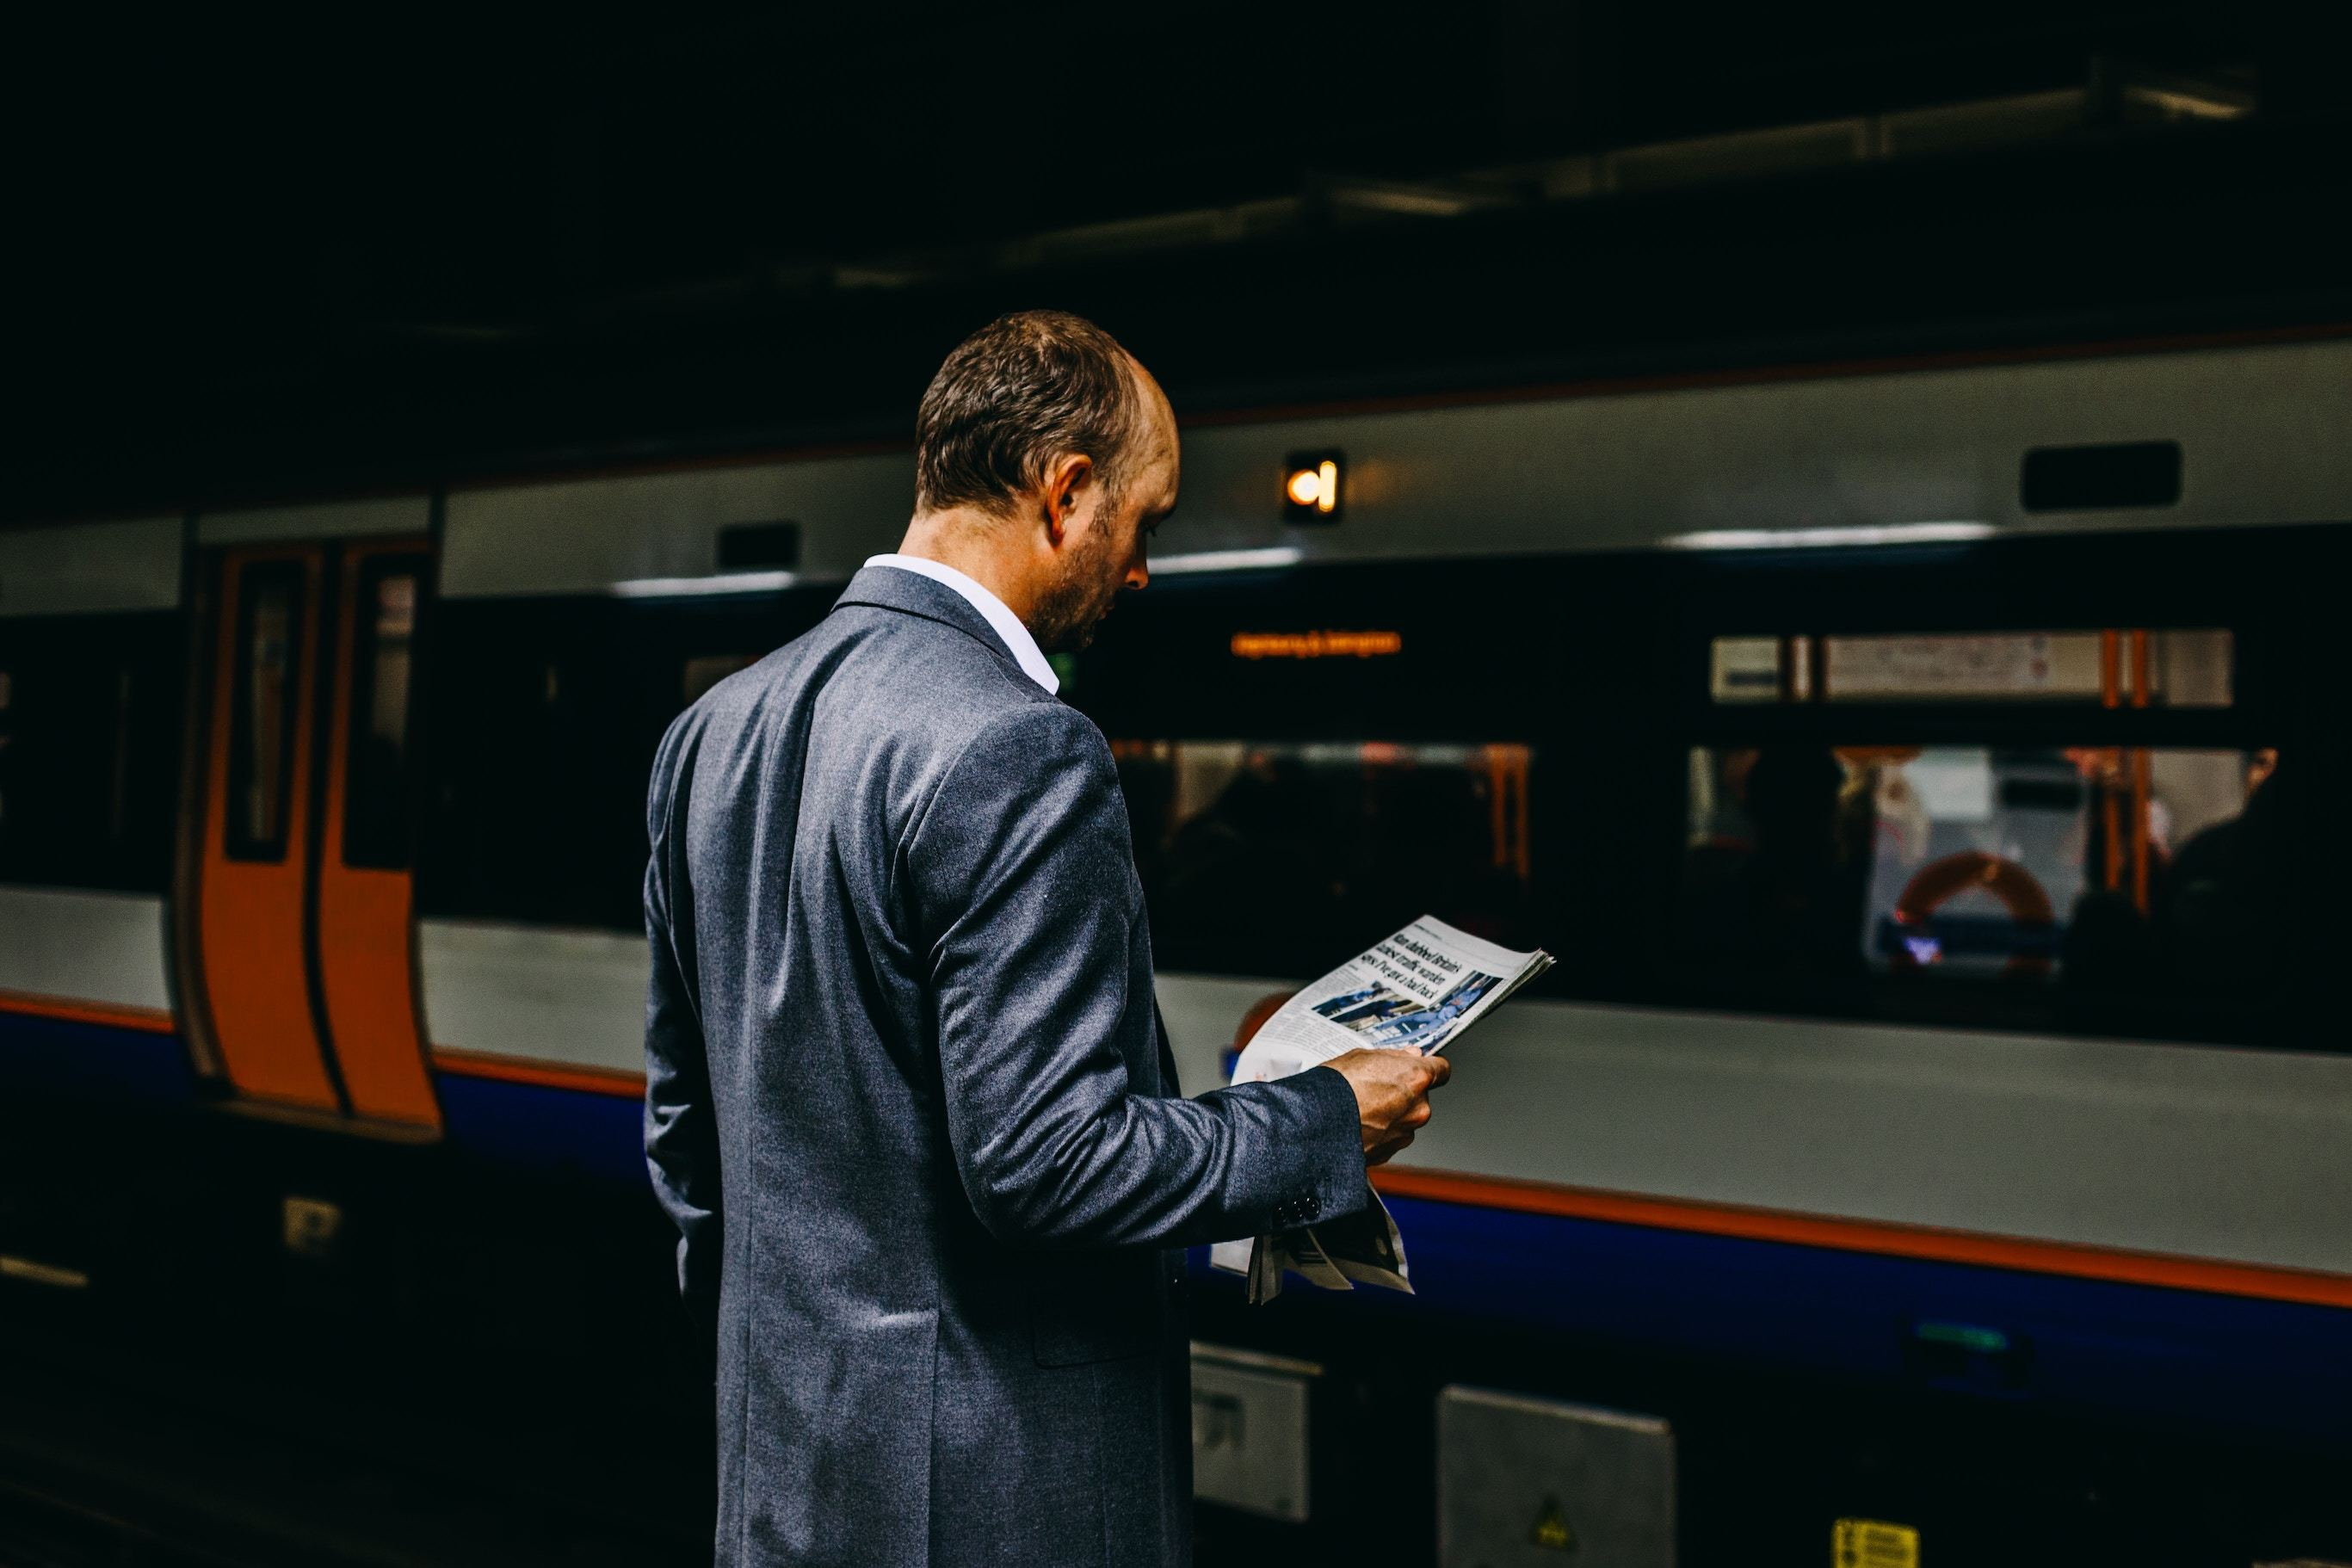 Man standing on train platform reading newspaper